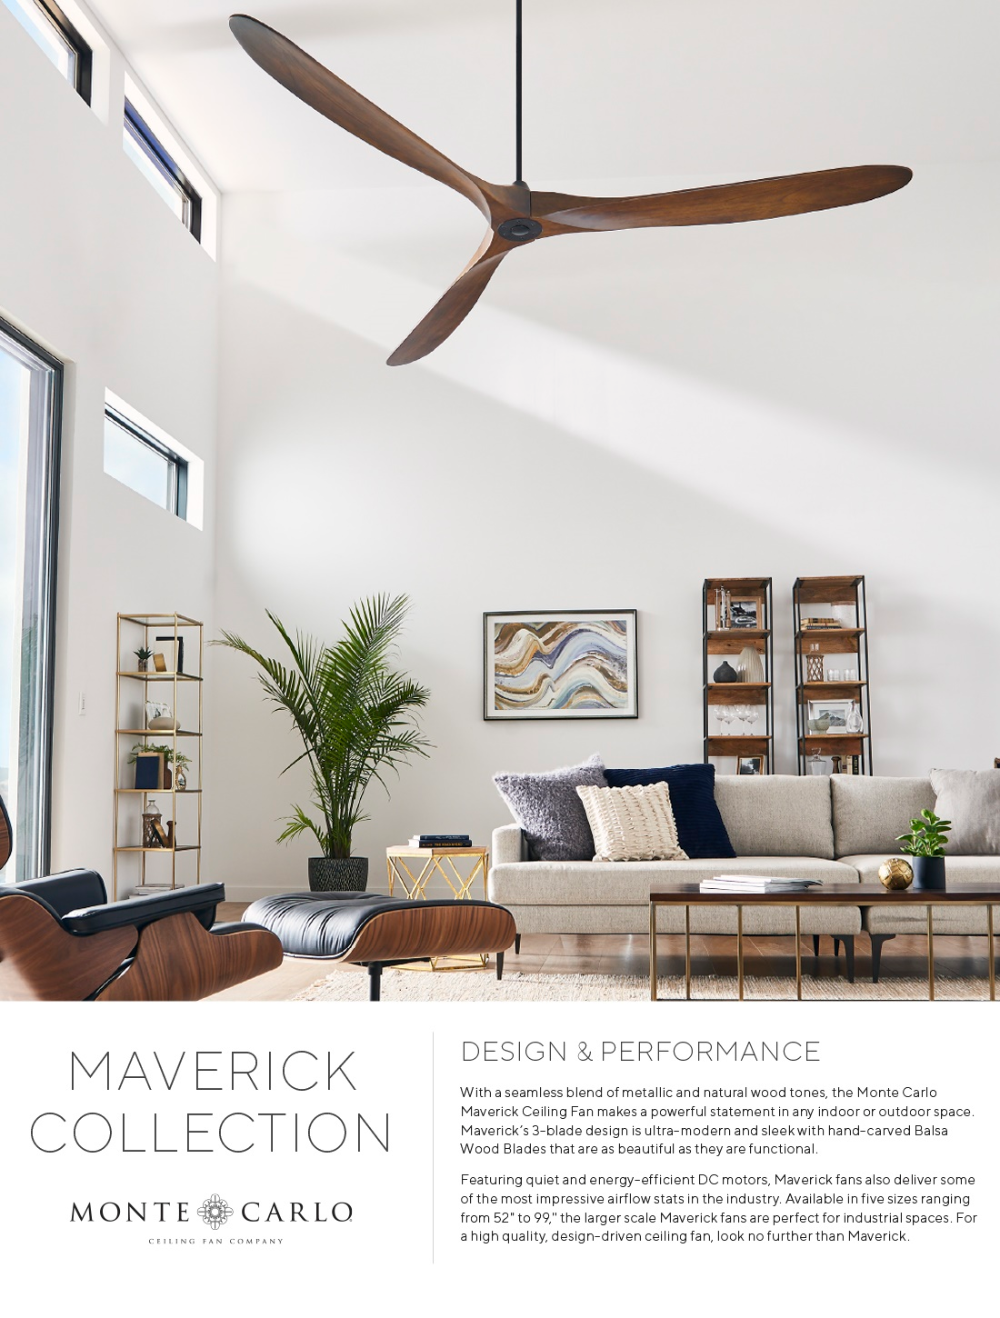 Monte Carlo Maverick 60 In Indoor Outdoor Matte Black Ceiling Fan With Dark Walnut Blades With Remo In 2020 Living Room Ceiling Fan Living Room Fans Black Ceiling Fan